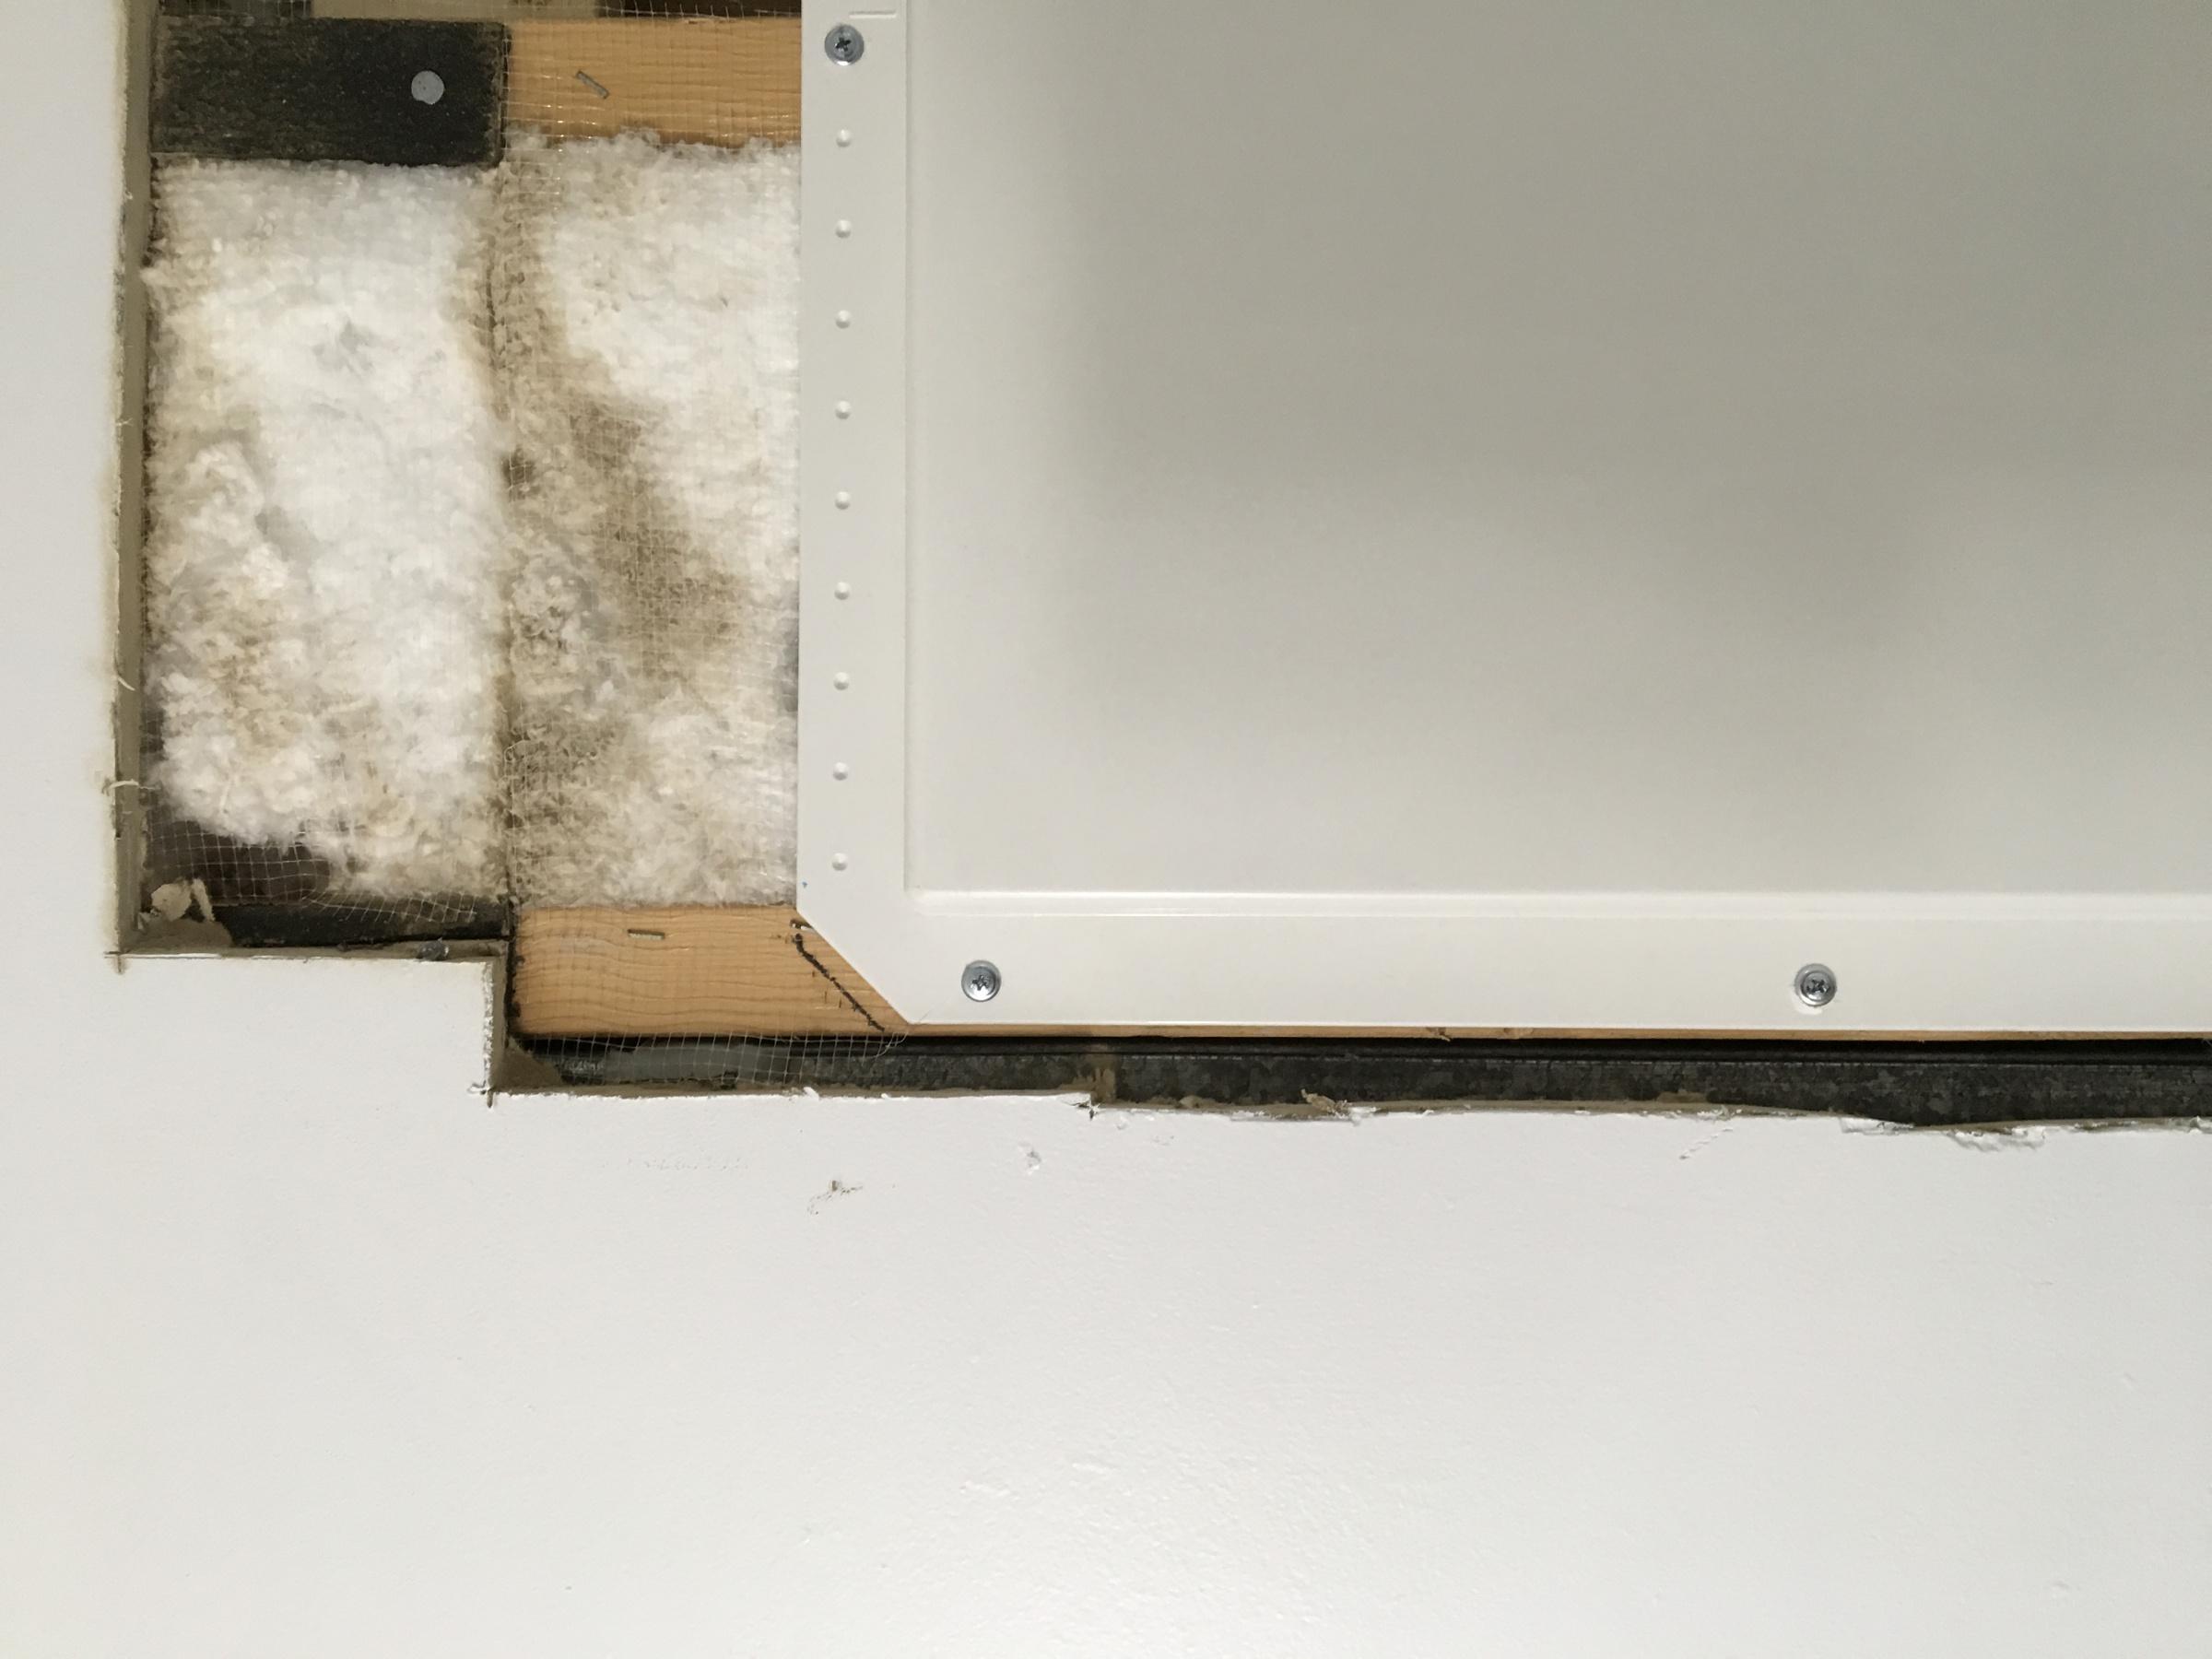 Impossible drywall around tub surround-bae04888-0317-4f2f-ab7e-4a120583bcfd.jpg